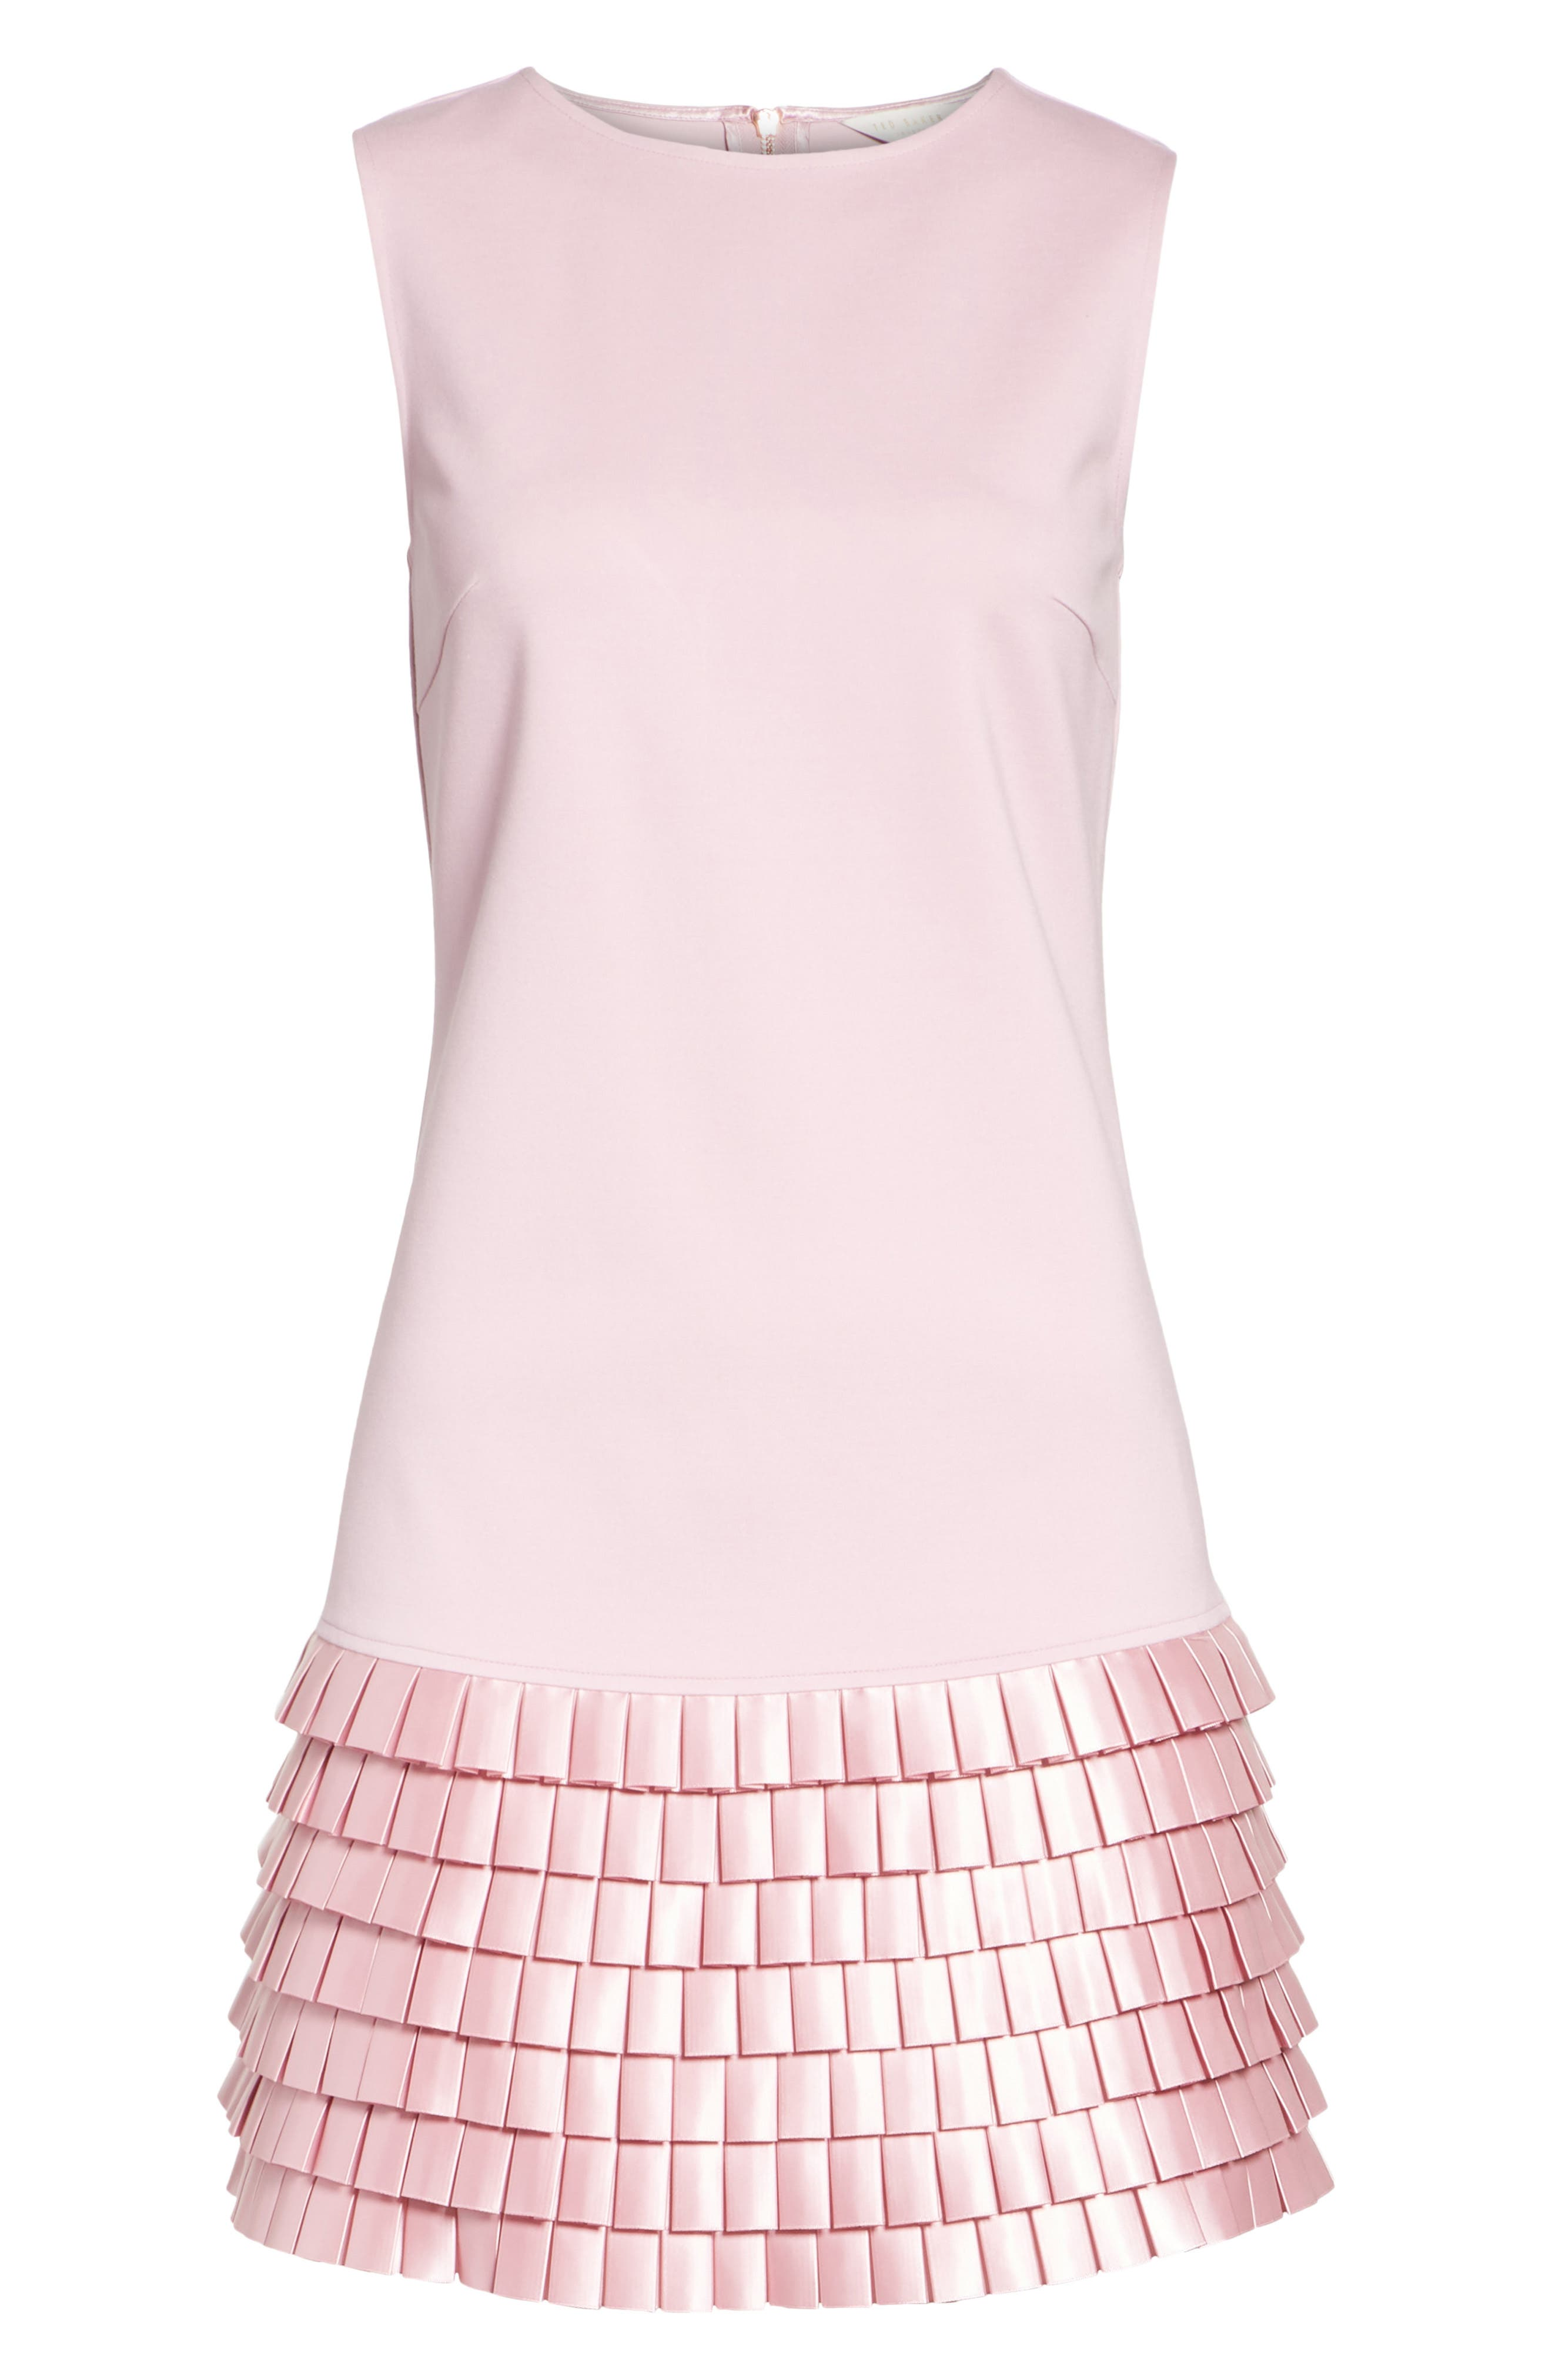 TED BAKER LONDON,                             Satin Pleat Detail Shift Dress,                             Alternate thumbnail 6, color,                             680